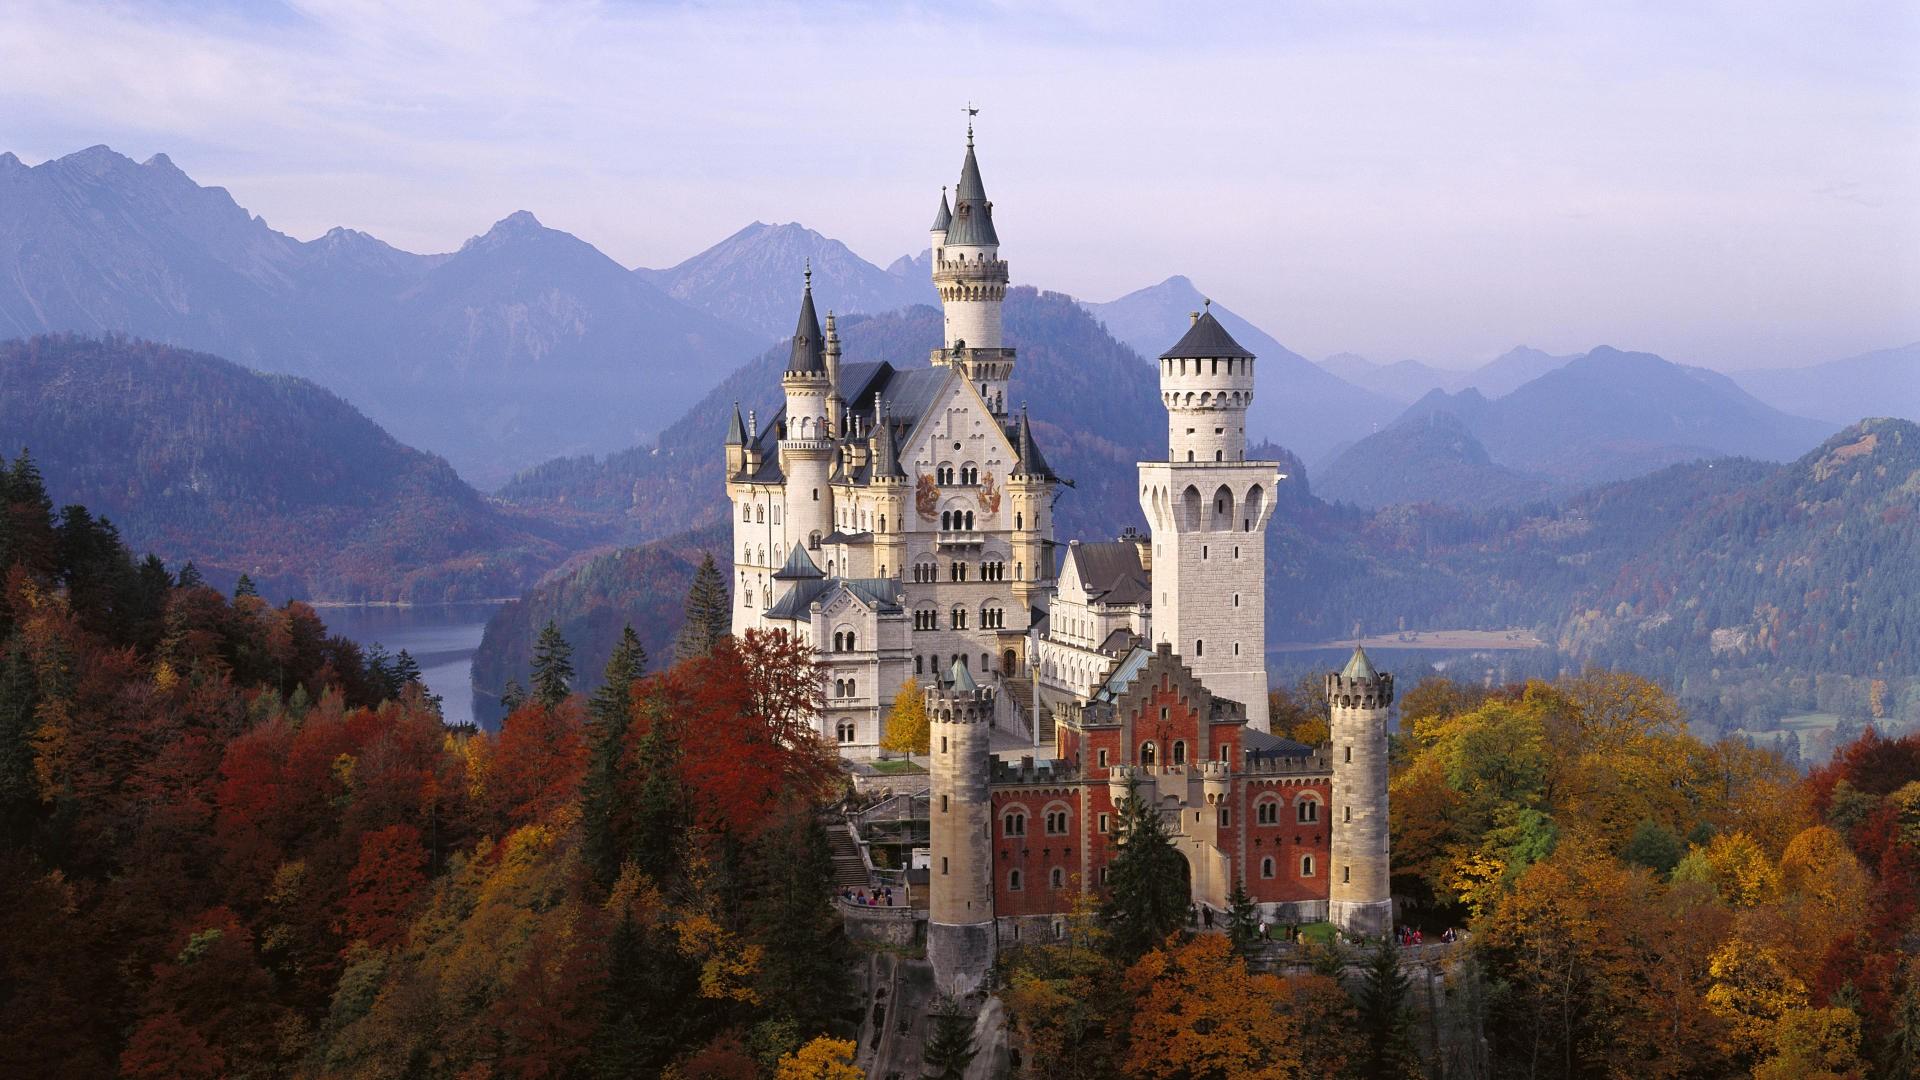 Neuschwanstein Castle Germany 1920x1080